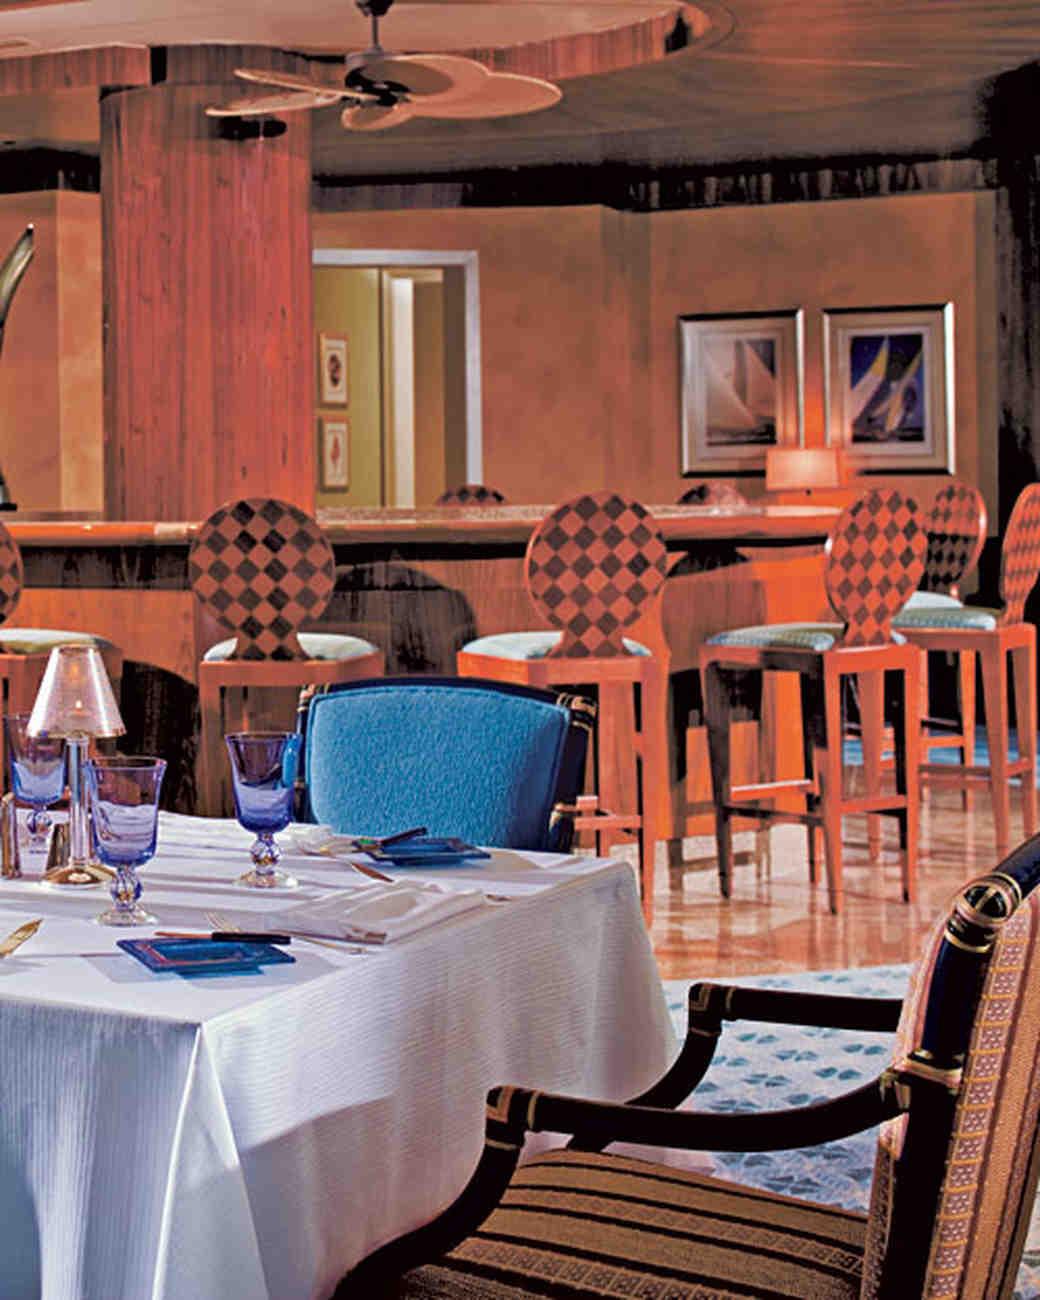 mwd_0111_restaurant_blue_ritz.jpg